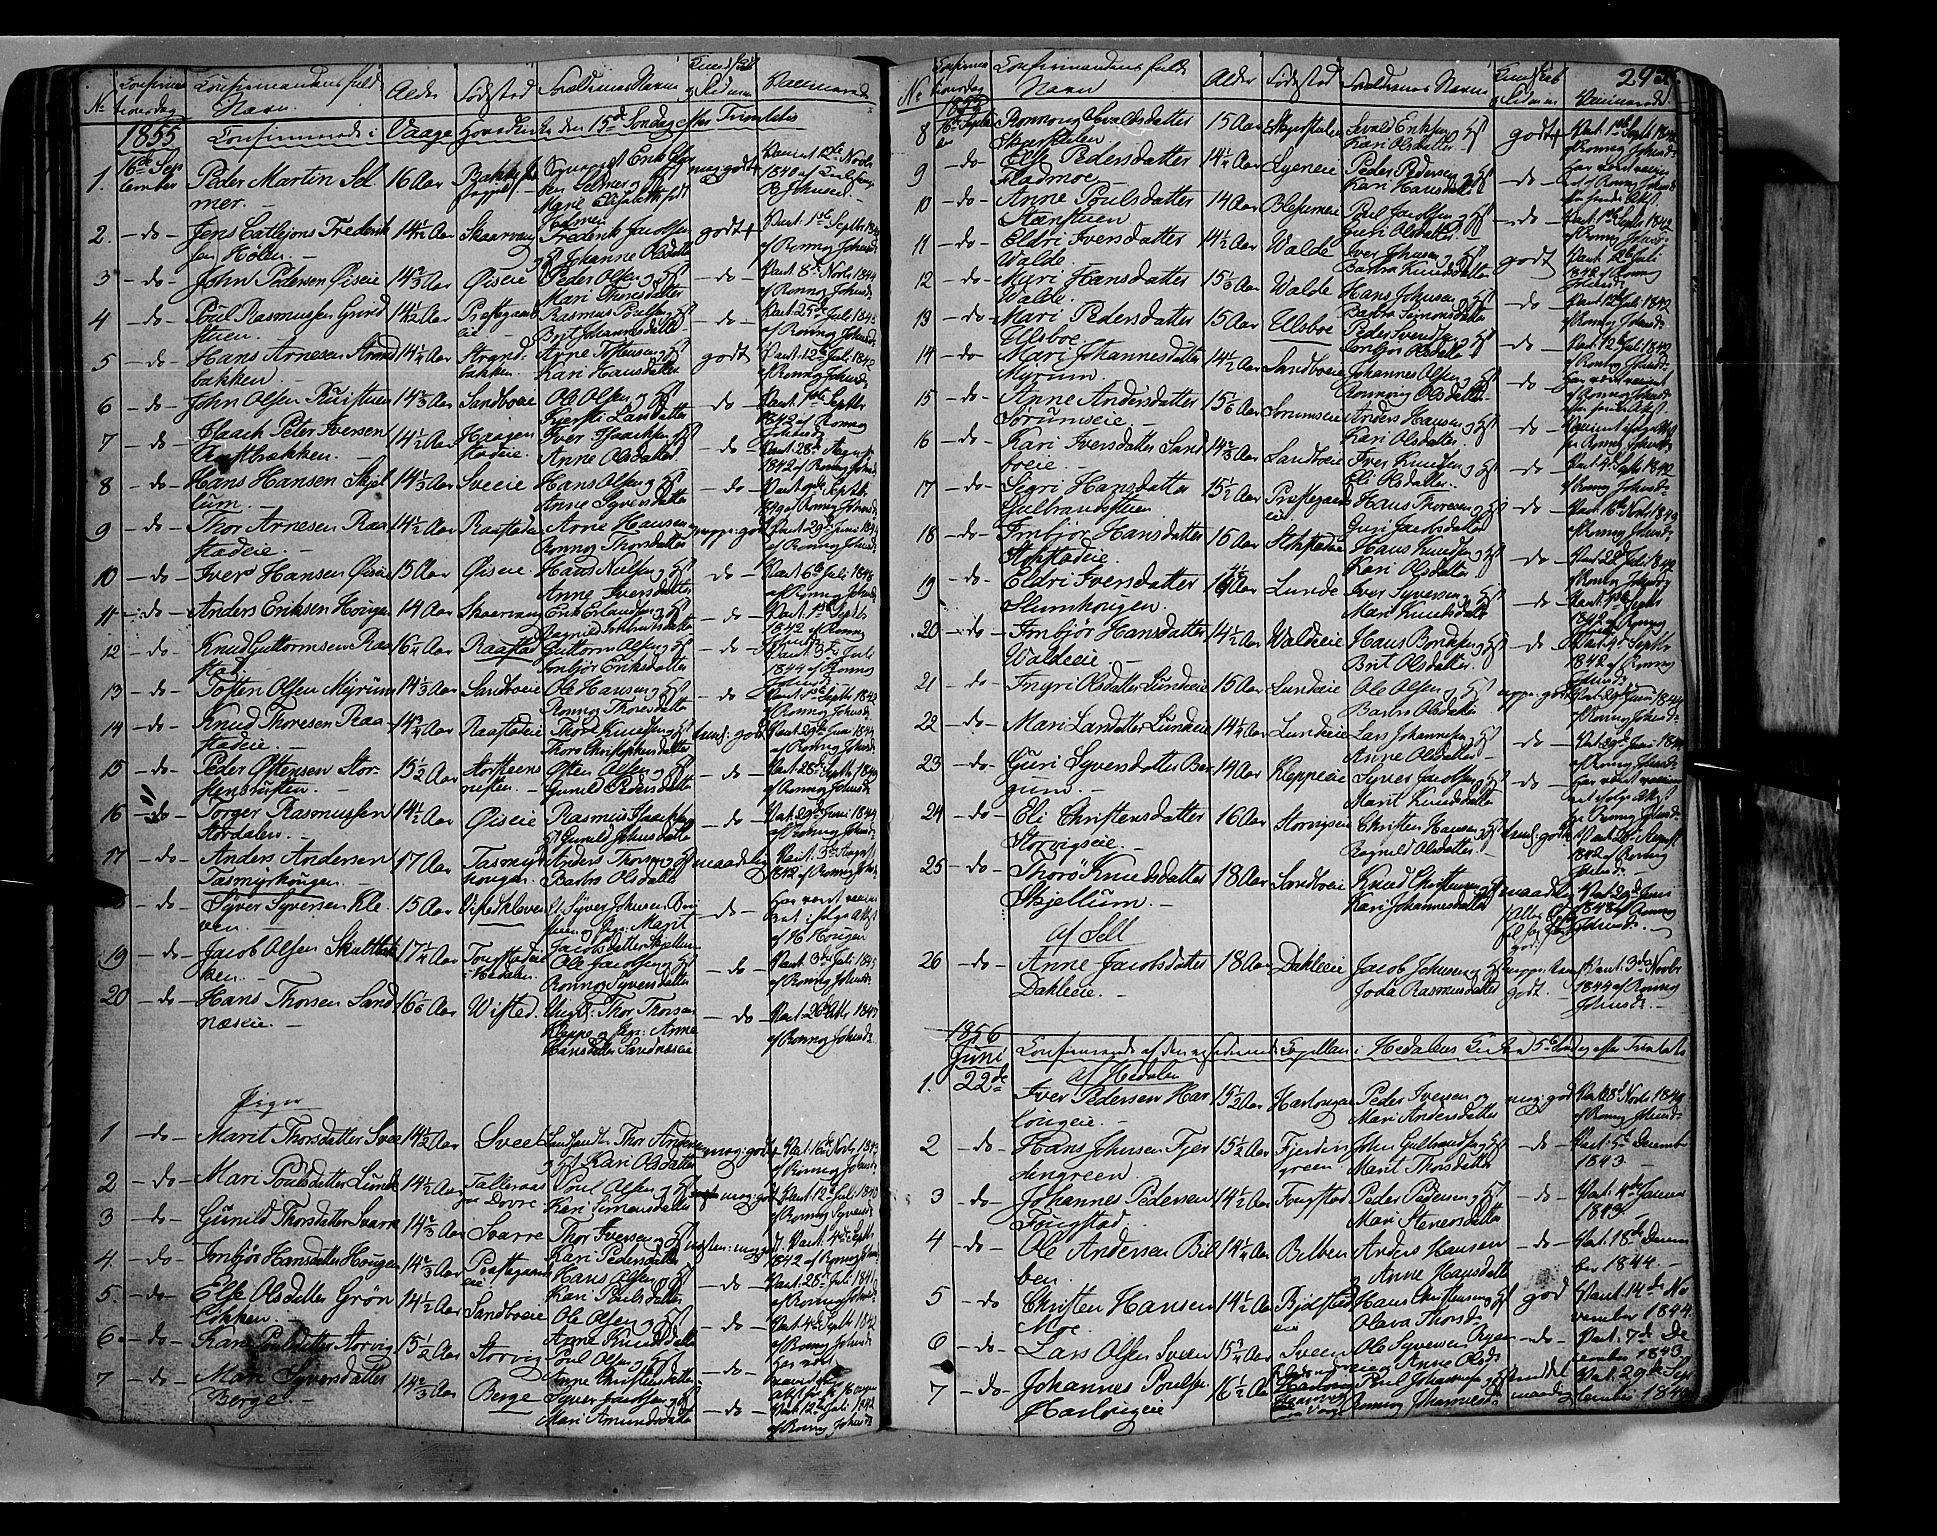 SAH, Vågå prestekontor, Ministerialbok nr. 5 /1, 1842-1856, s. 293